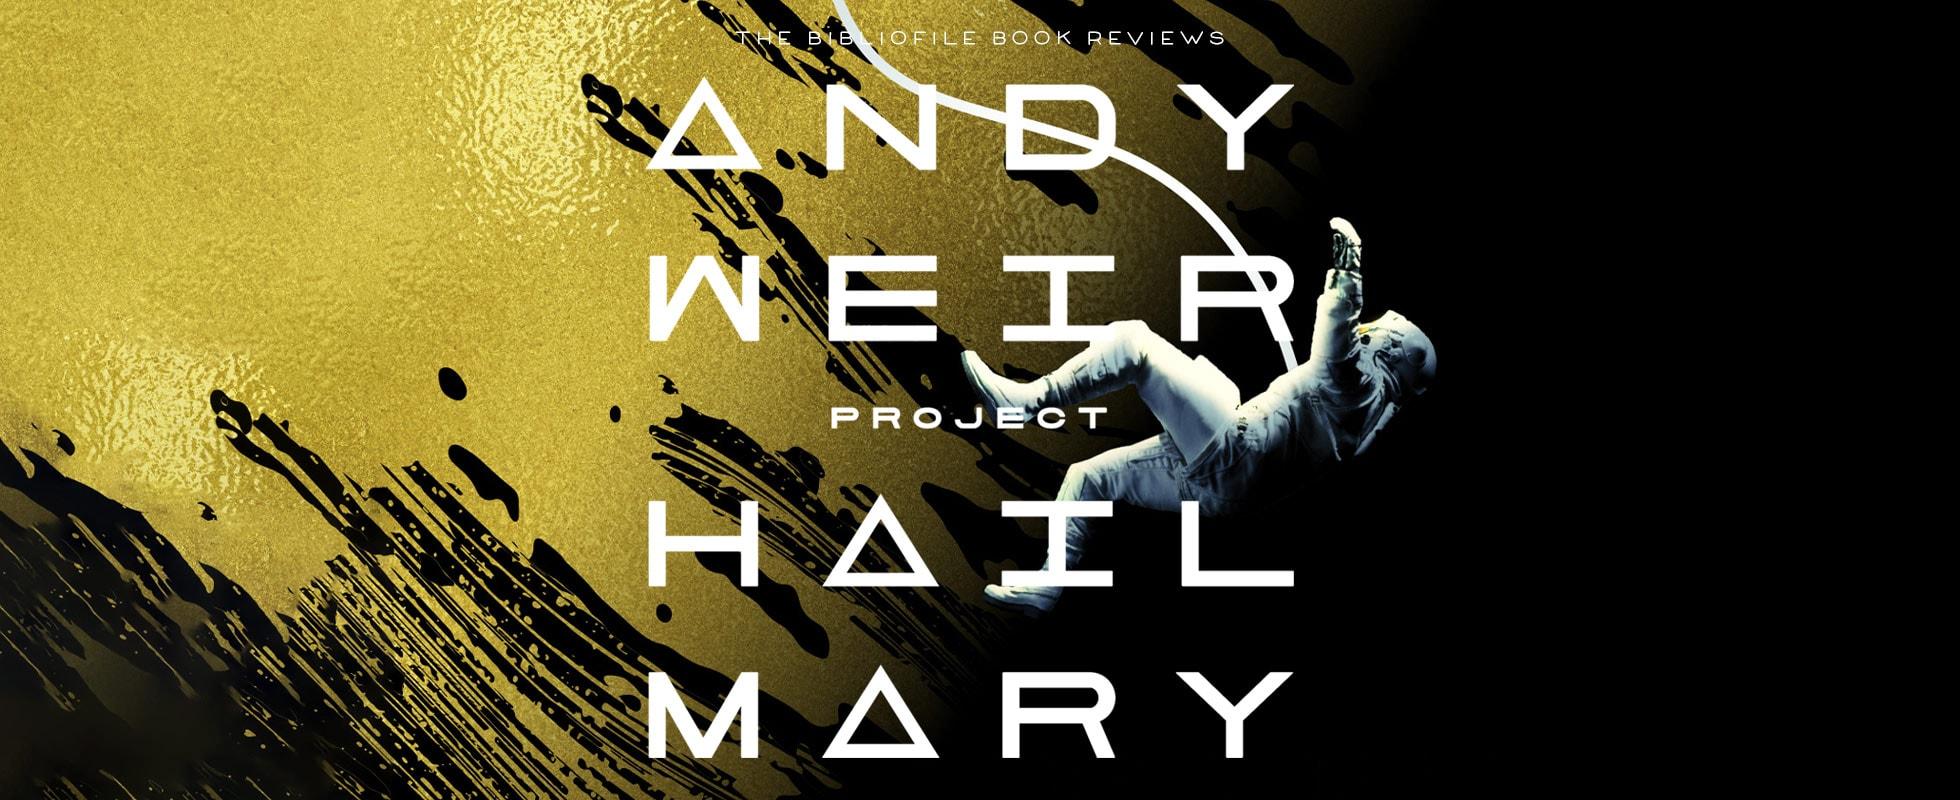 project hail mary book review summary synopsis recap plot